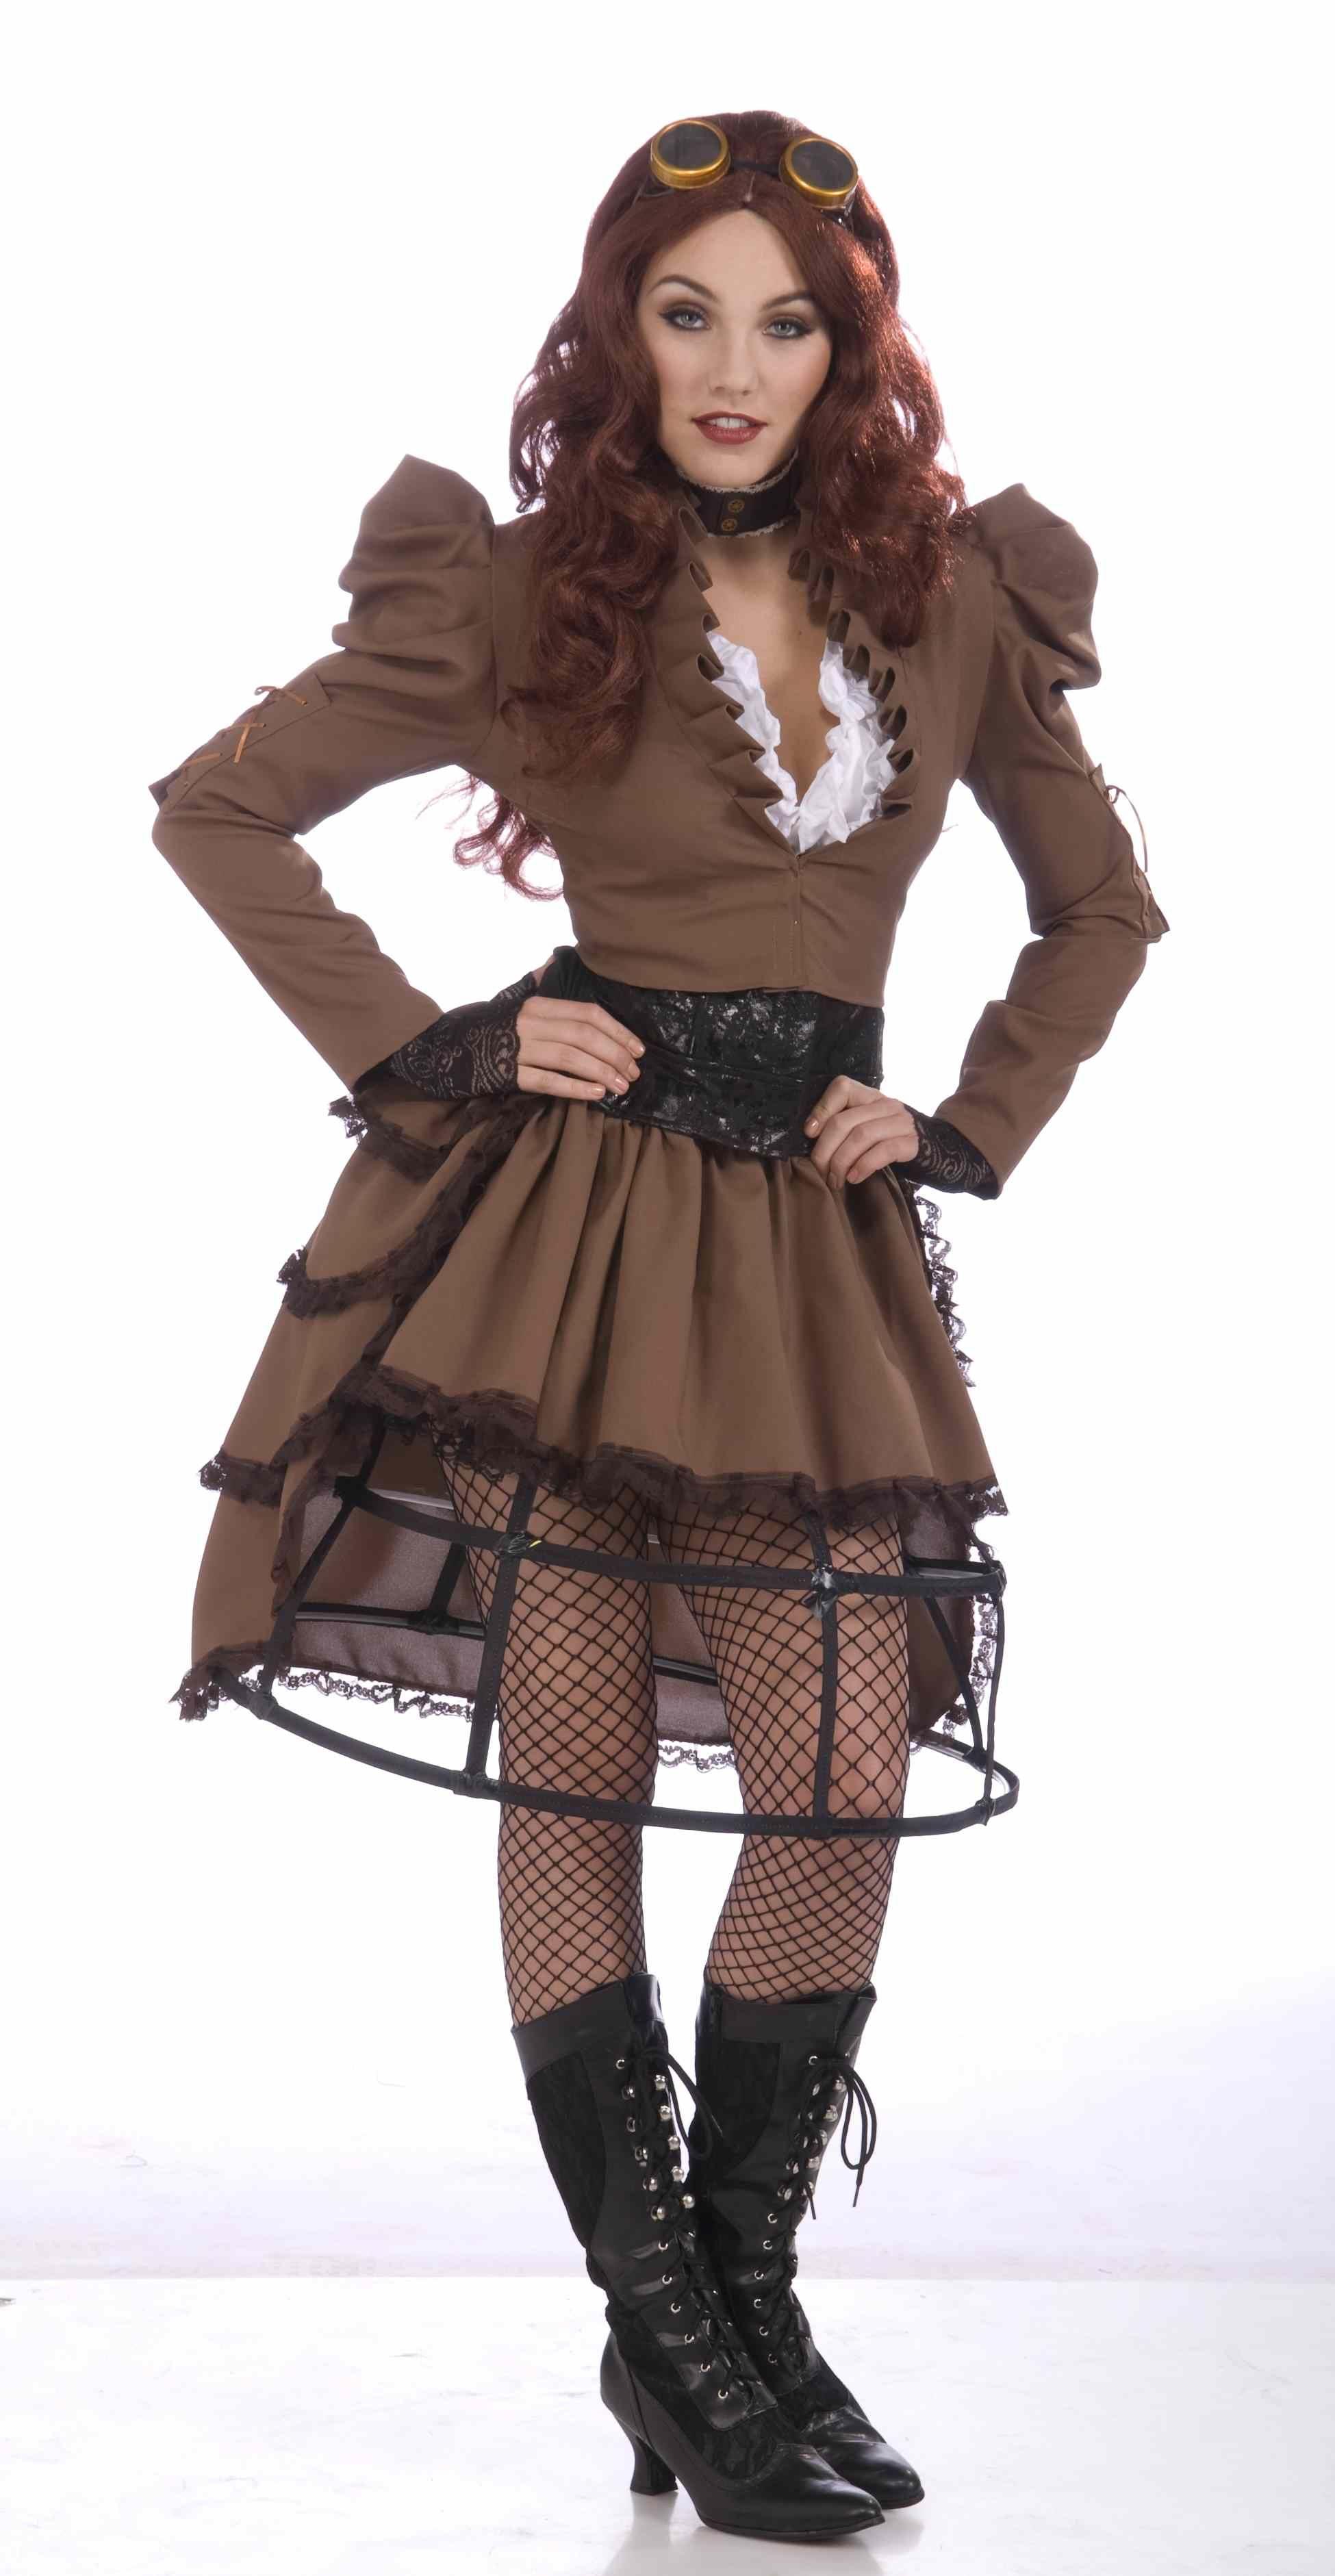 Steampunk Fashion for Women Over 40 or 50 | Boomerinas.com